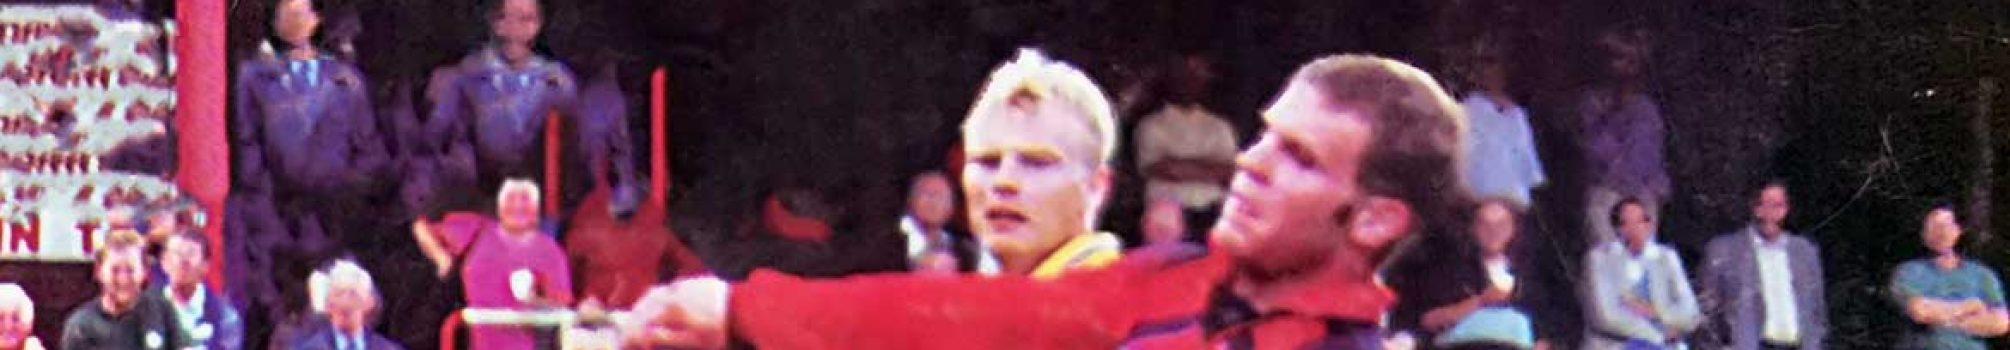 wilkins-canvey-1999